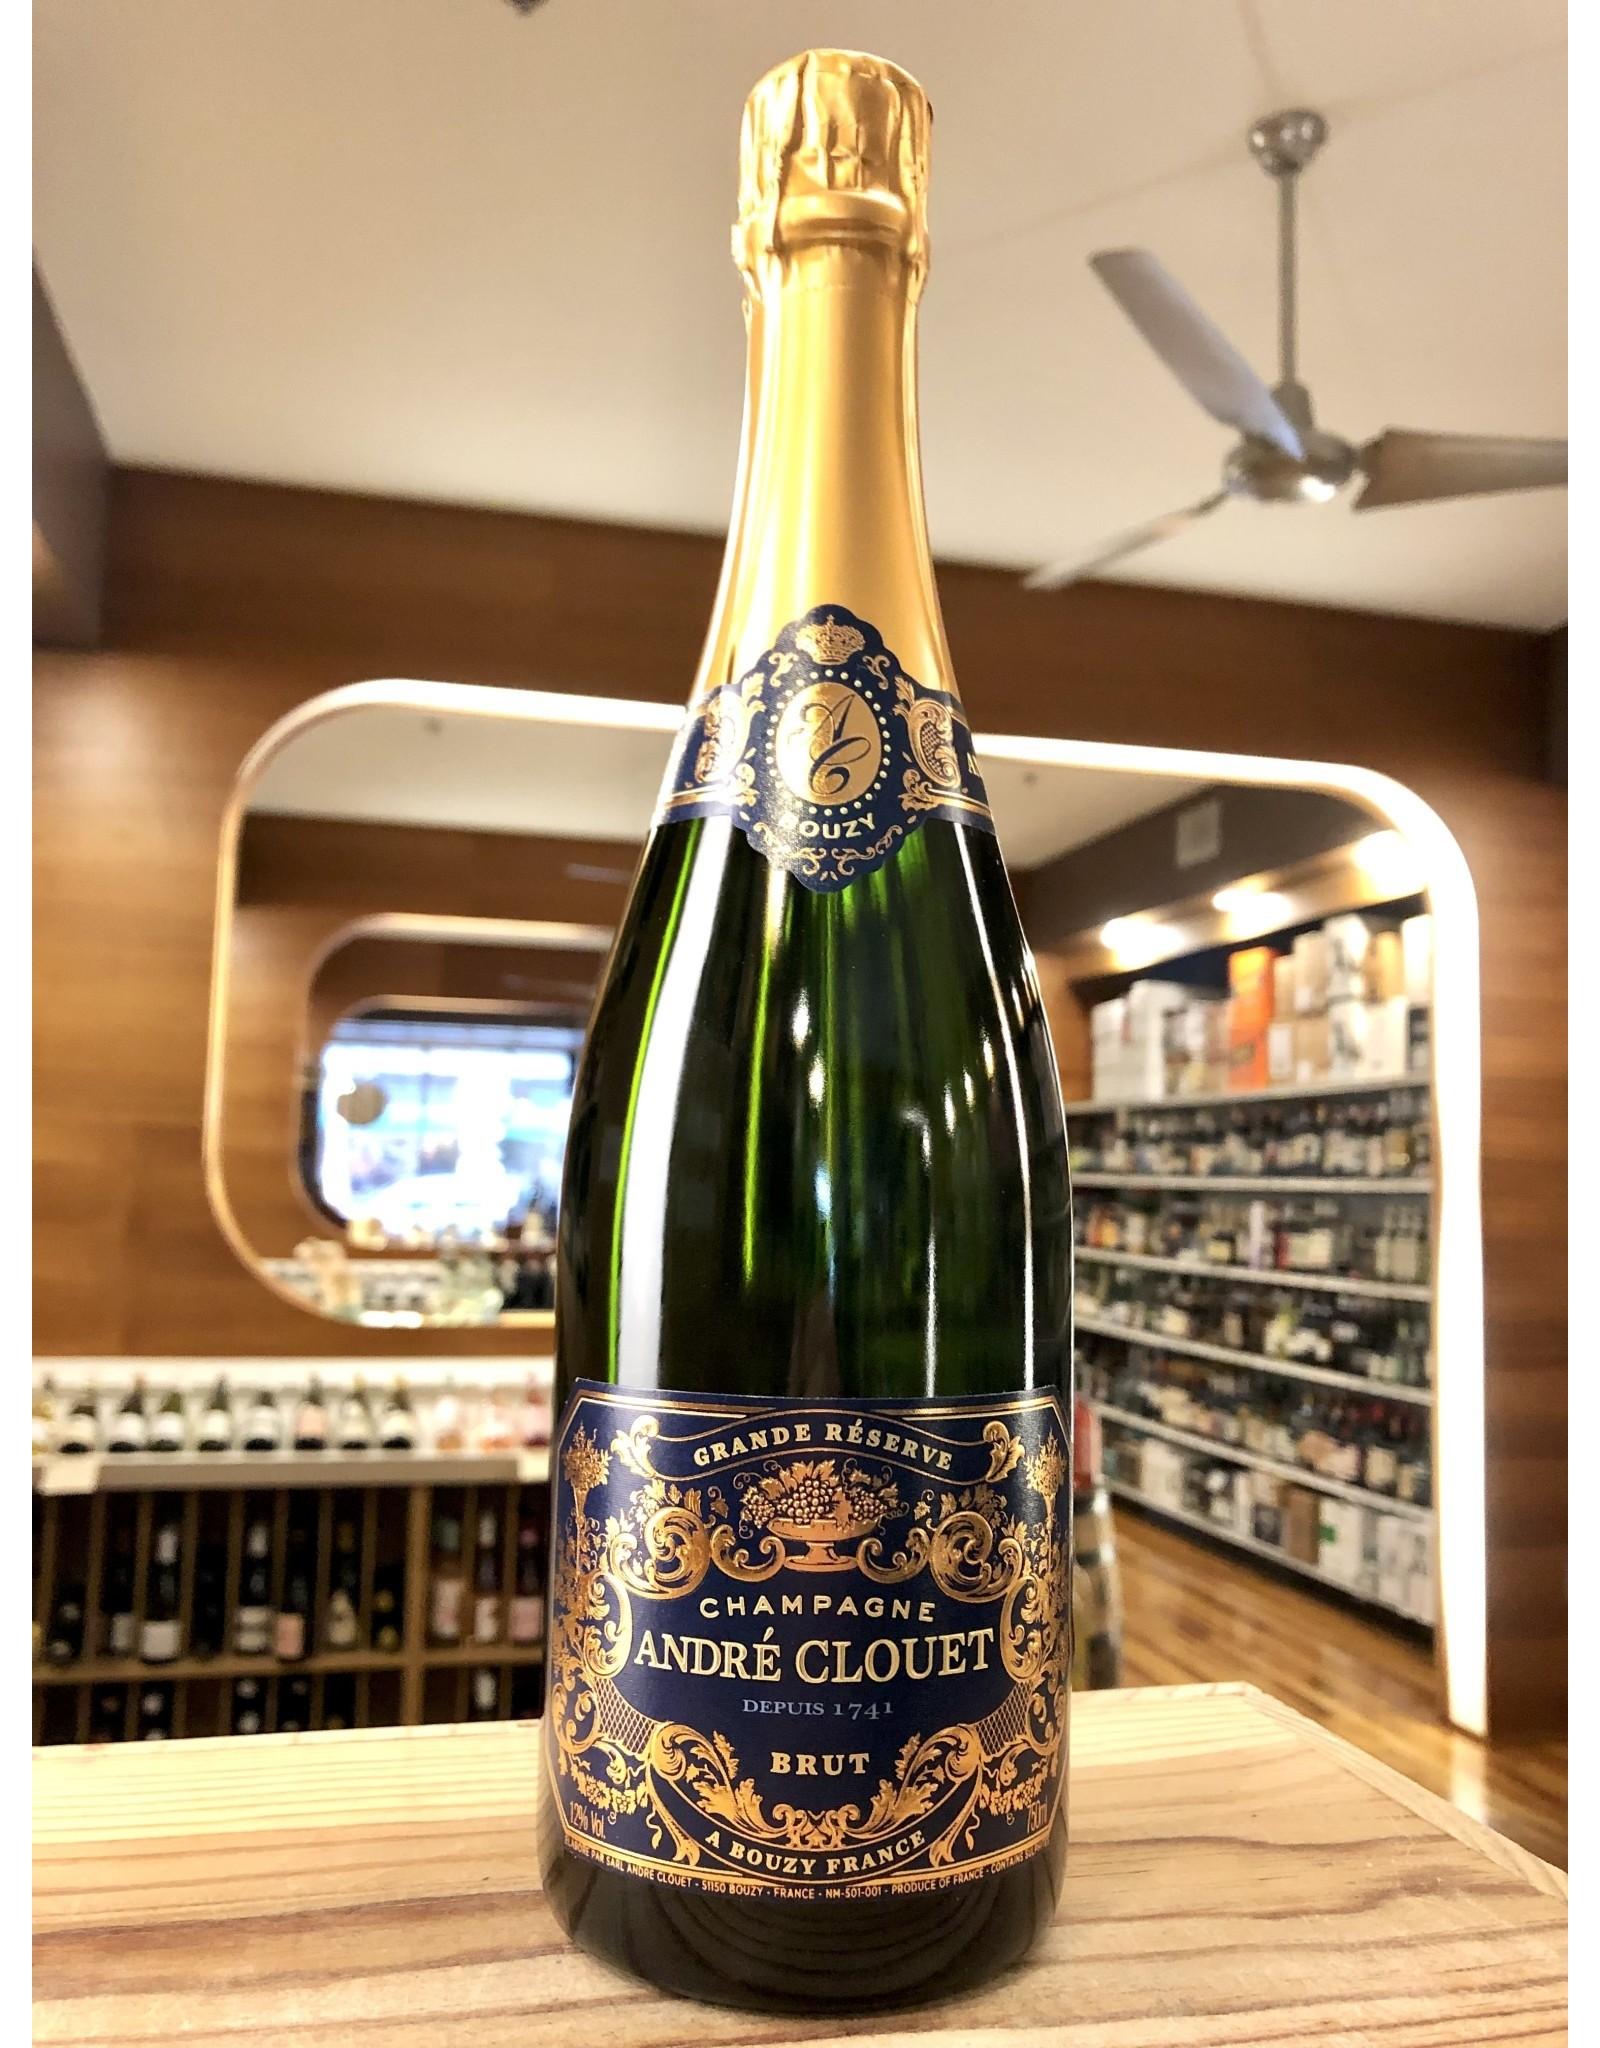 Andre Clouet Grande Reserve Brut Champagne - 750 ML